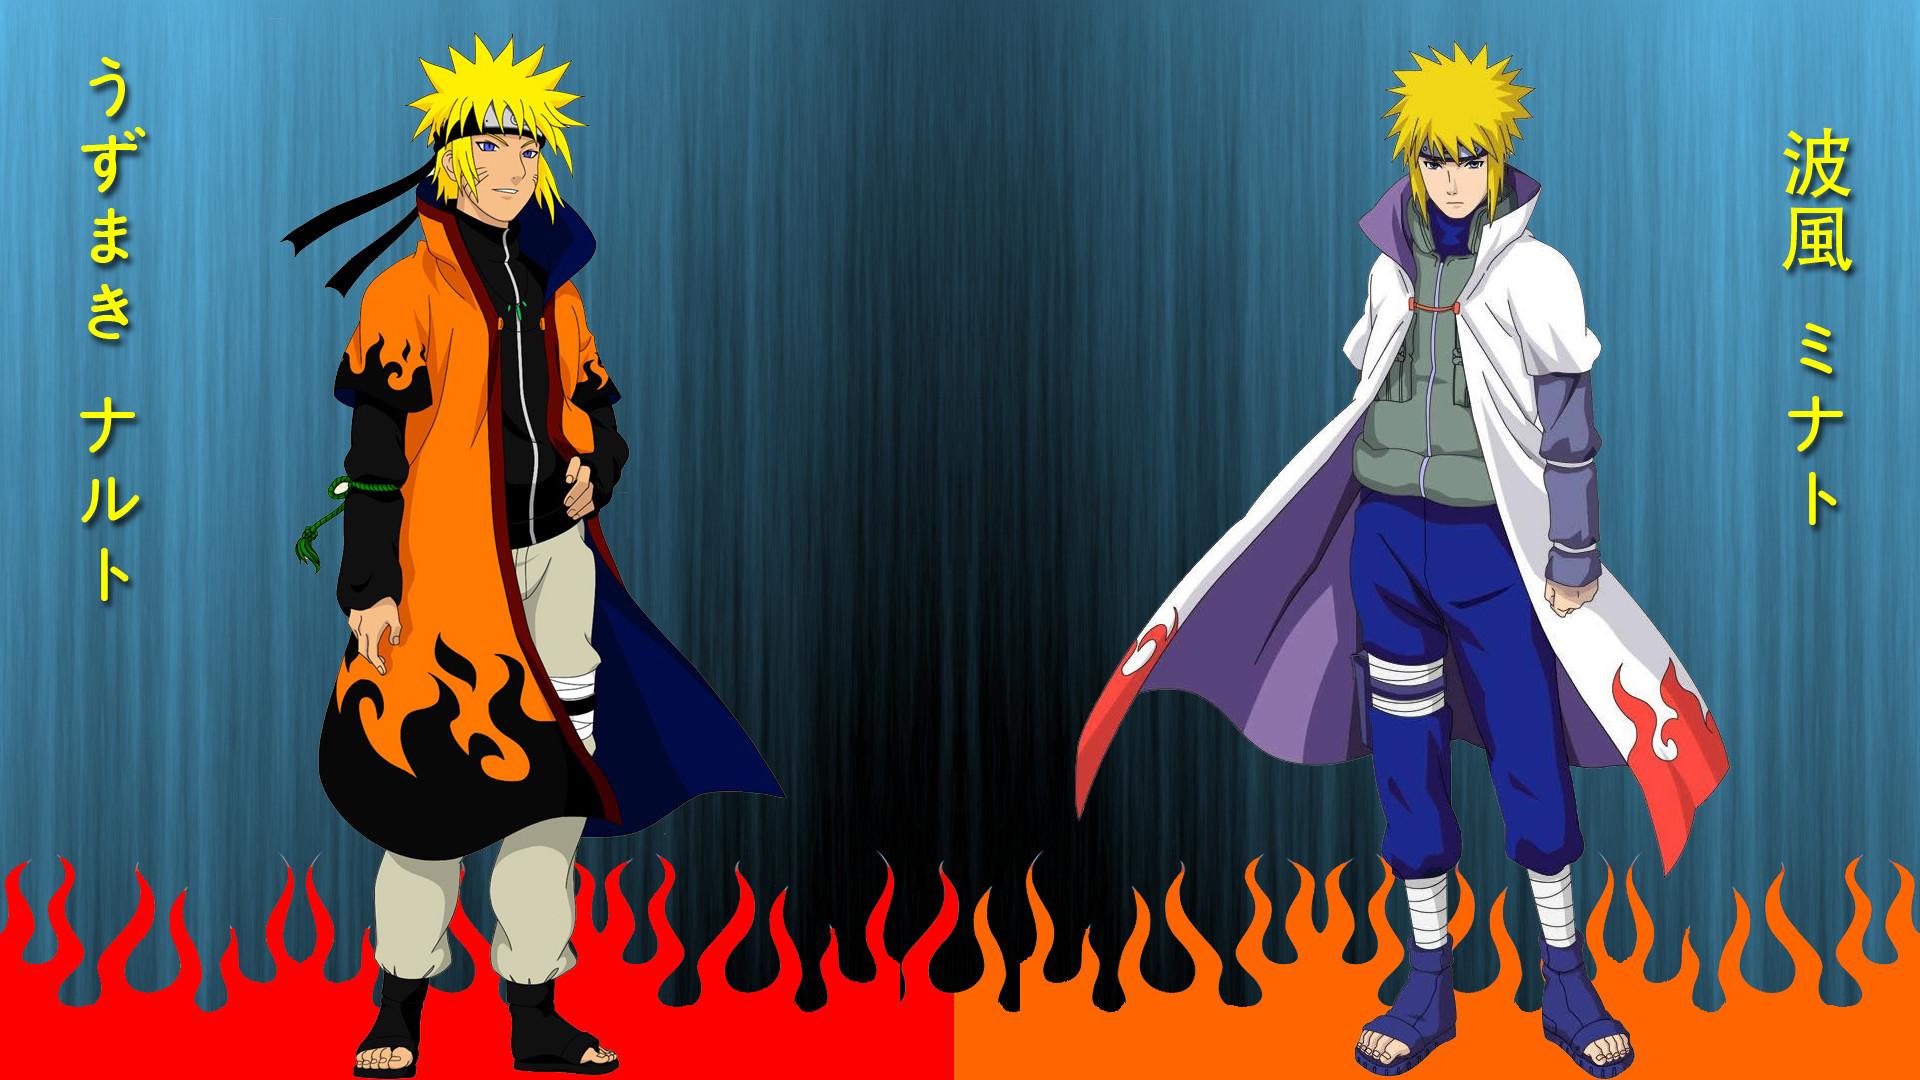 Naruto Live Wallpaper Iphone 7 Gaara Hd Wallpapers 56 Images